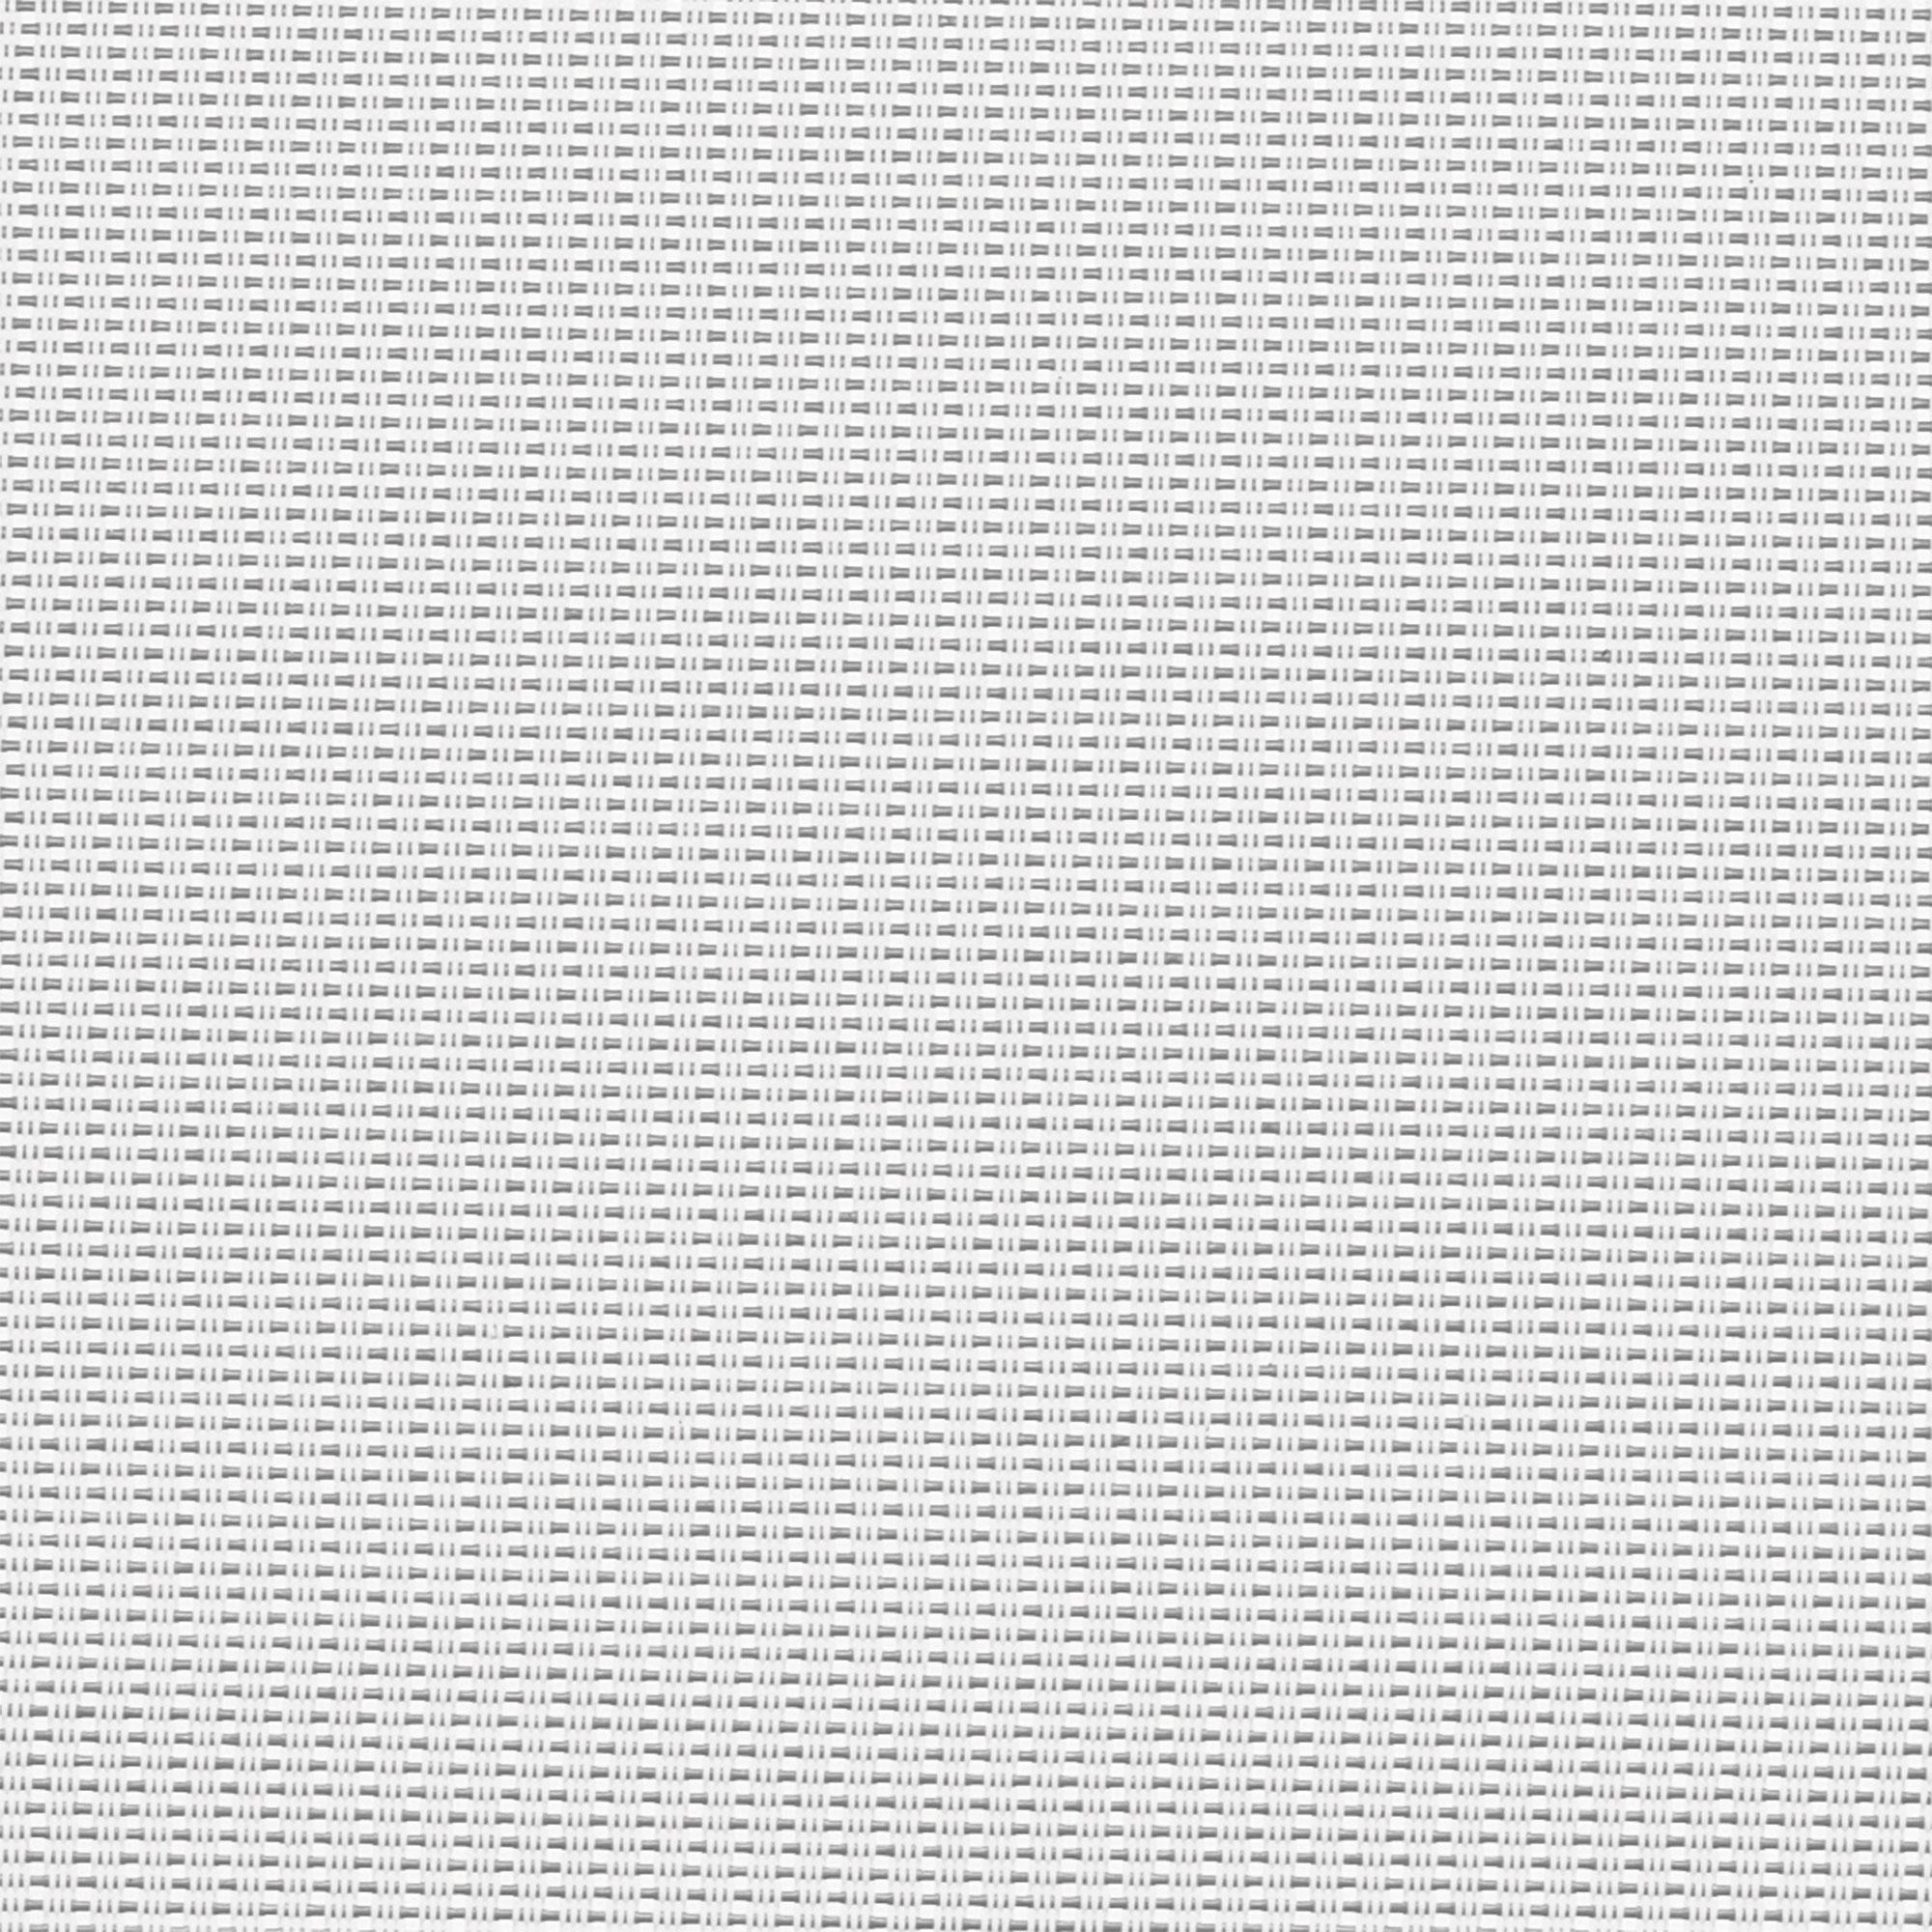 swatch-3000-v01-pale-grey-web.jpg